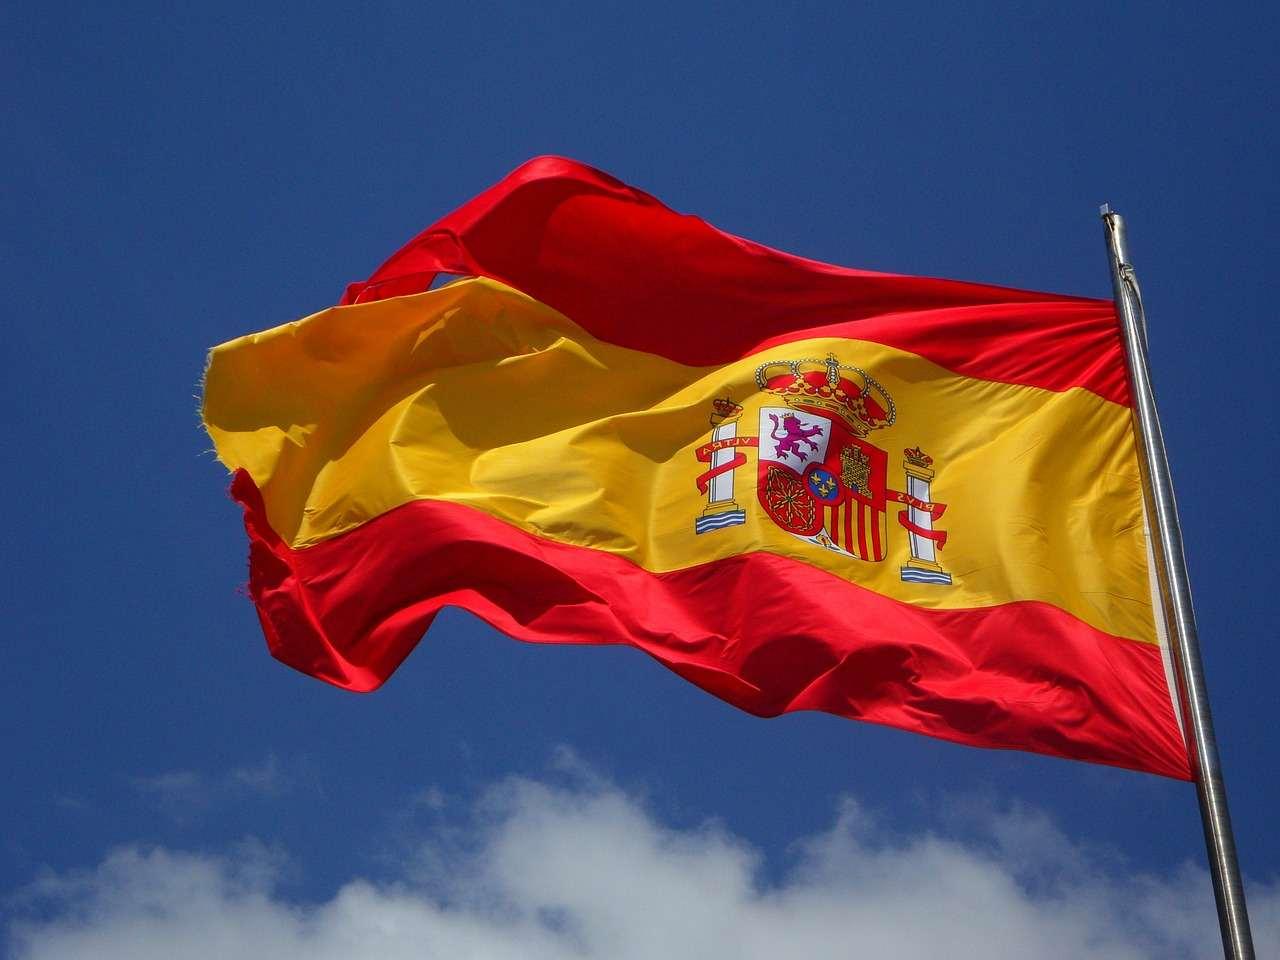 Mascherine obbligatorie in spiaggia in Spagna